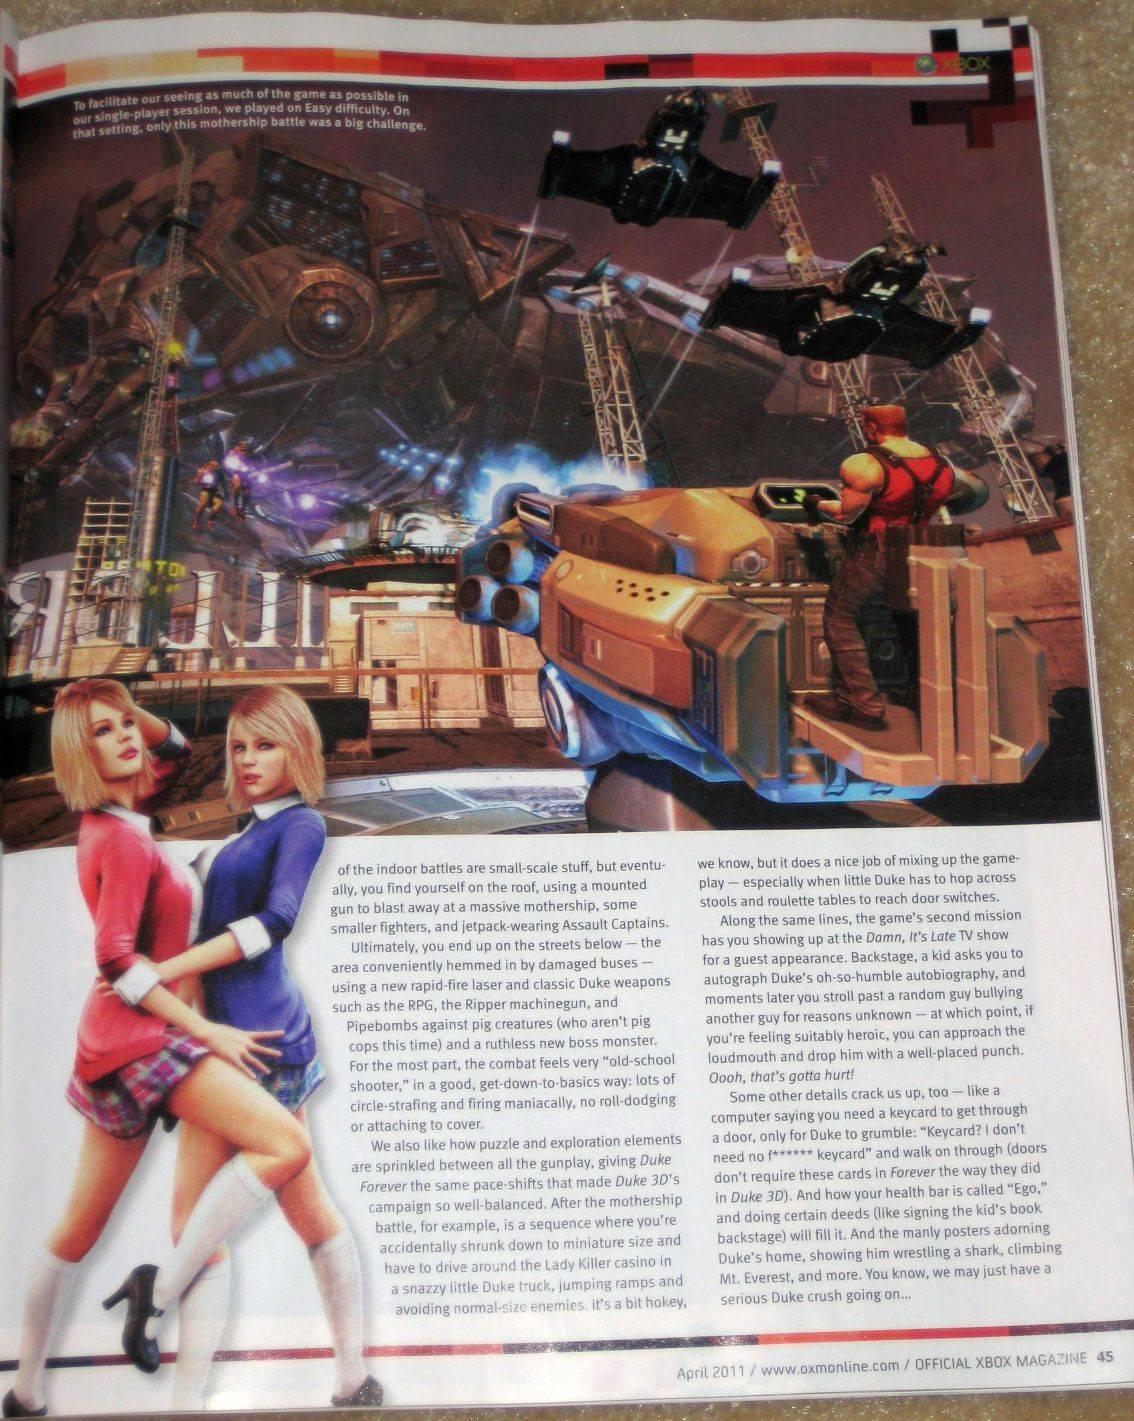 Nové detaily o Duke Nukem Forever 33345